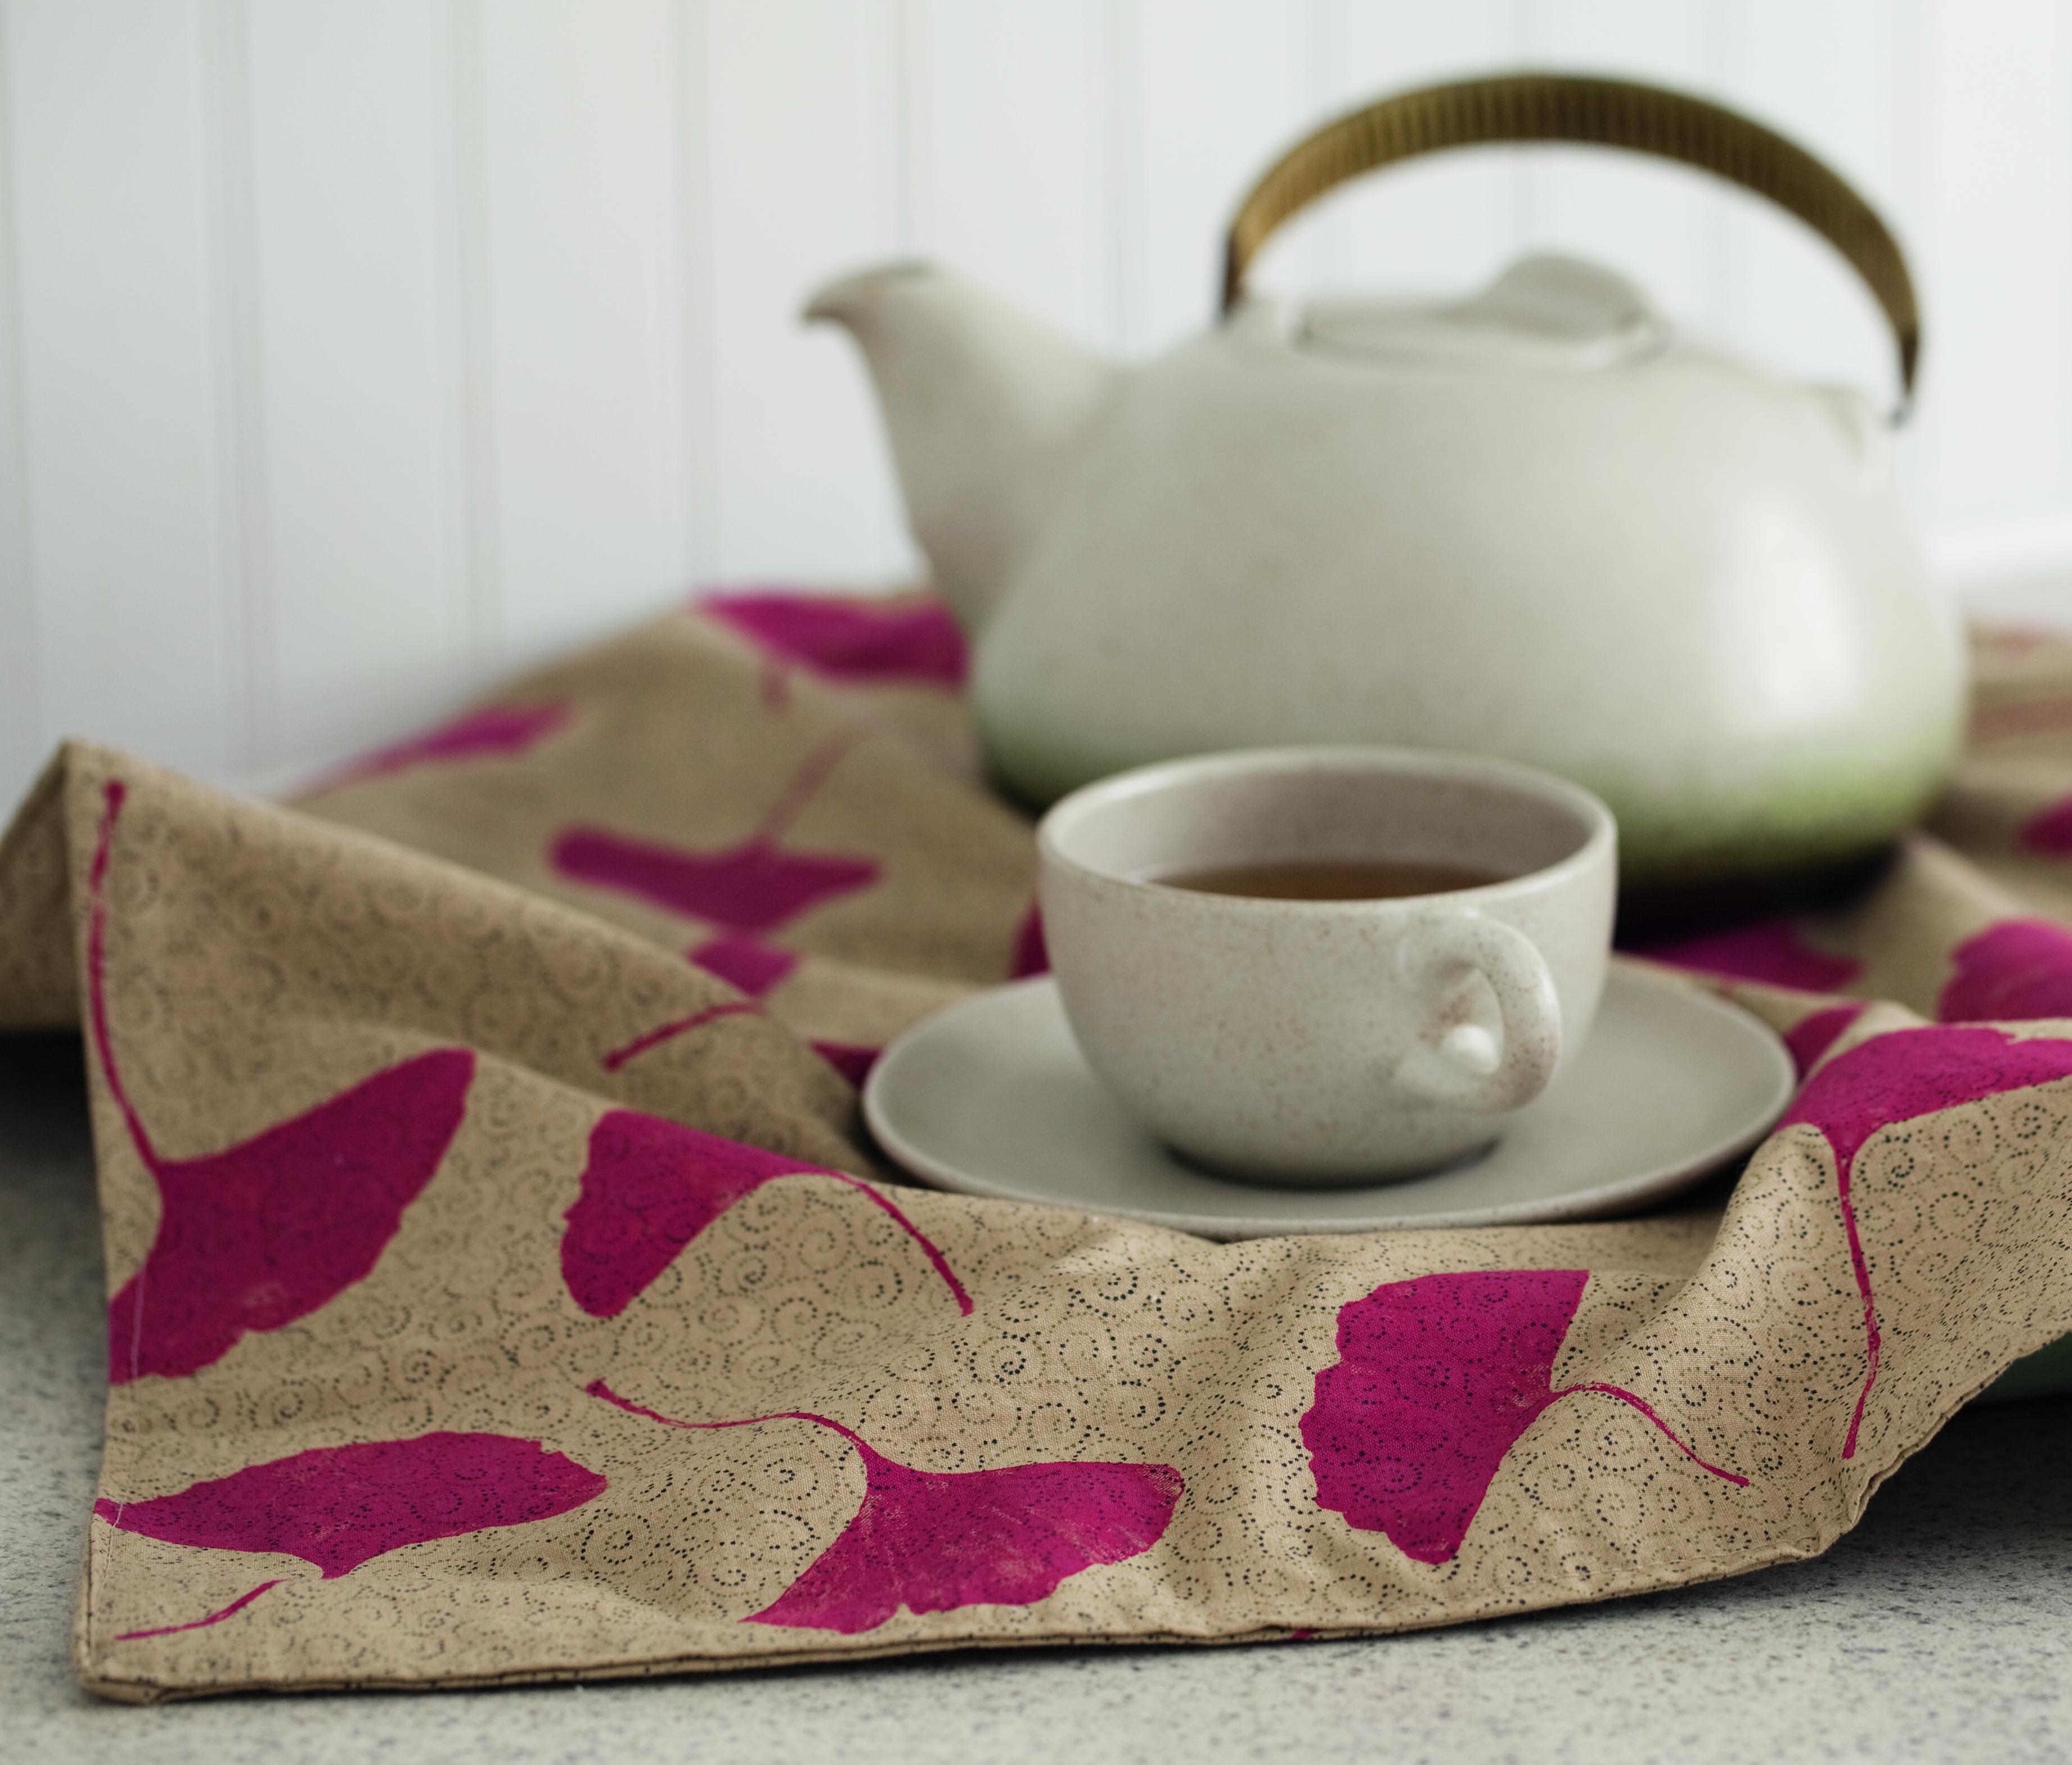 119_ Teapot Wrap, textile paint, nature printed gingko leaves on fabric - (c) Adam Mastoon